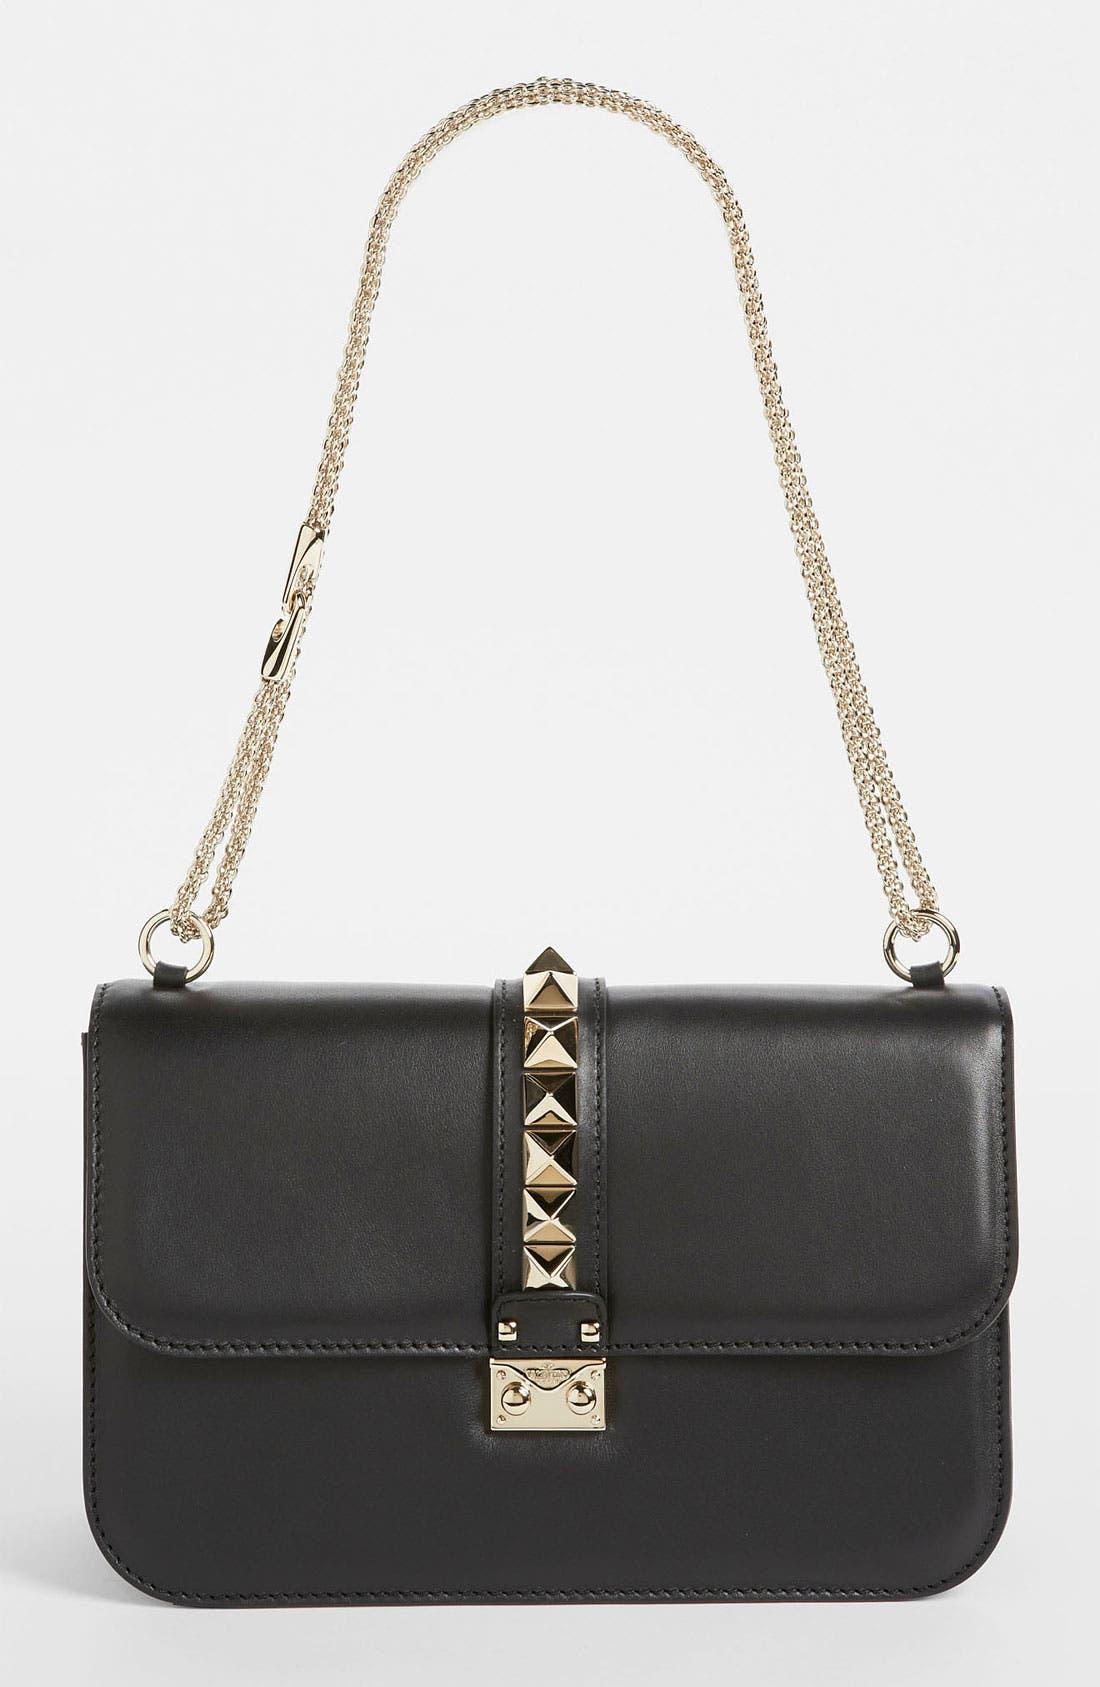 Alternate Image 1 Selected - Valentino 'Lock - Medium' Leather Shoulder Bag